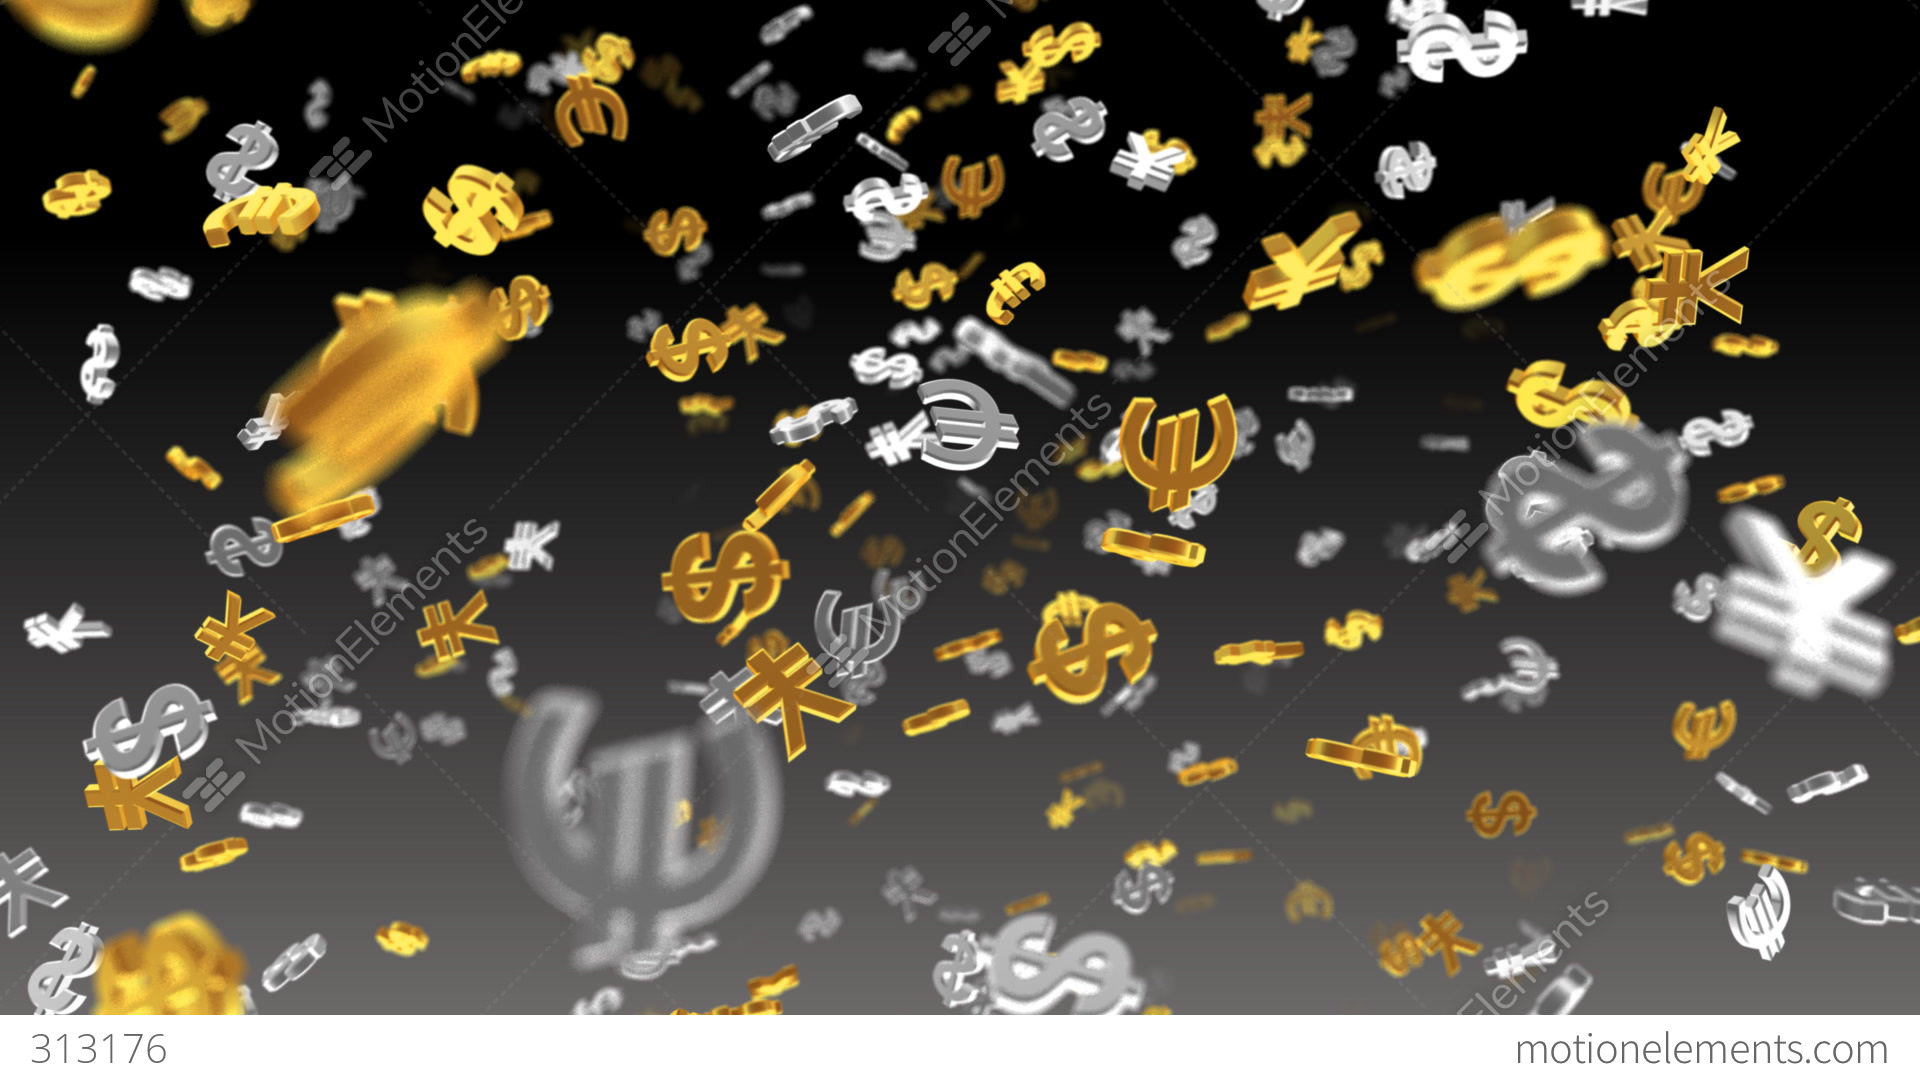 Money symbol 2e dollar euro yen b hd stock animation 313176 money symbol 2e dollar euro yen b hd stock video footage buycottarizona Gallery